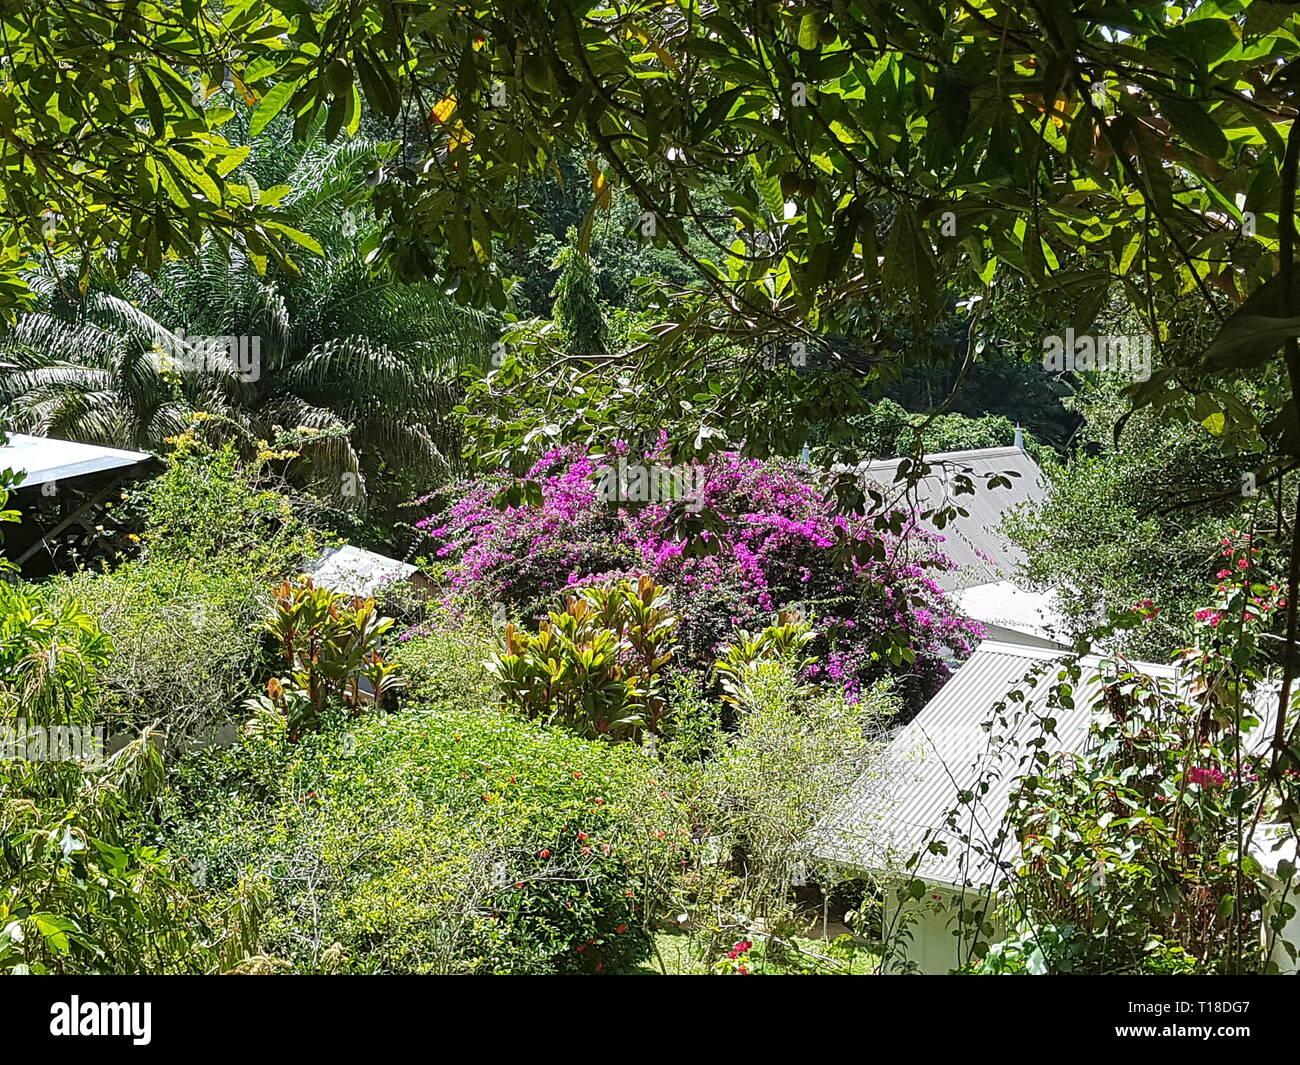 Pink flowers in the spice garden Jardin Du Roi on the Seychelles island Mahe Stock Photo